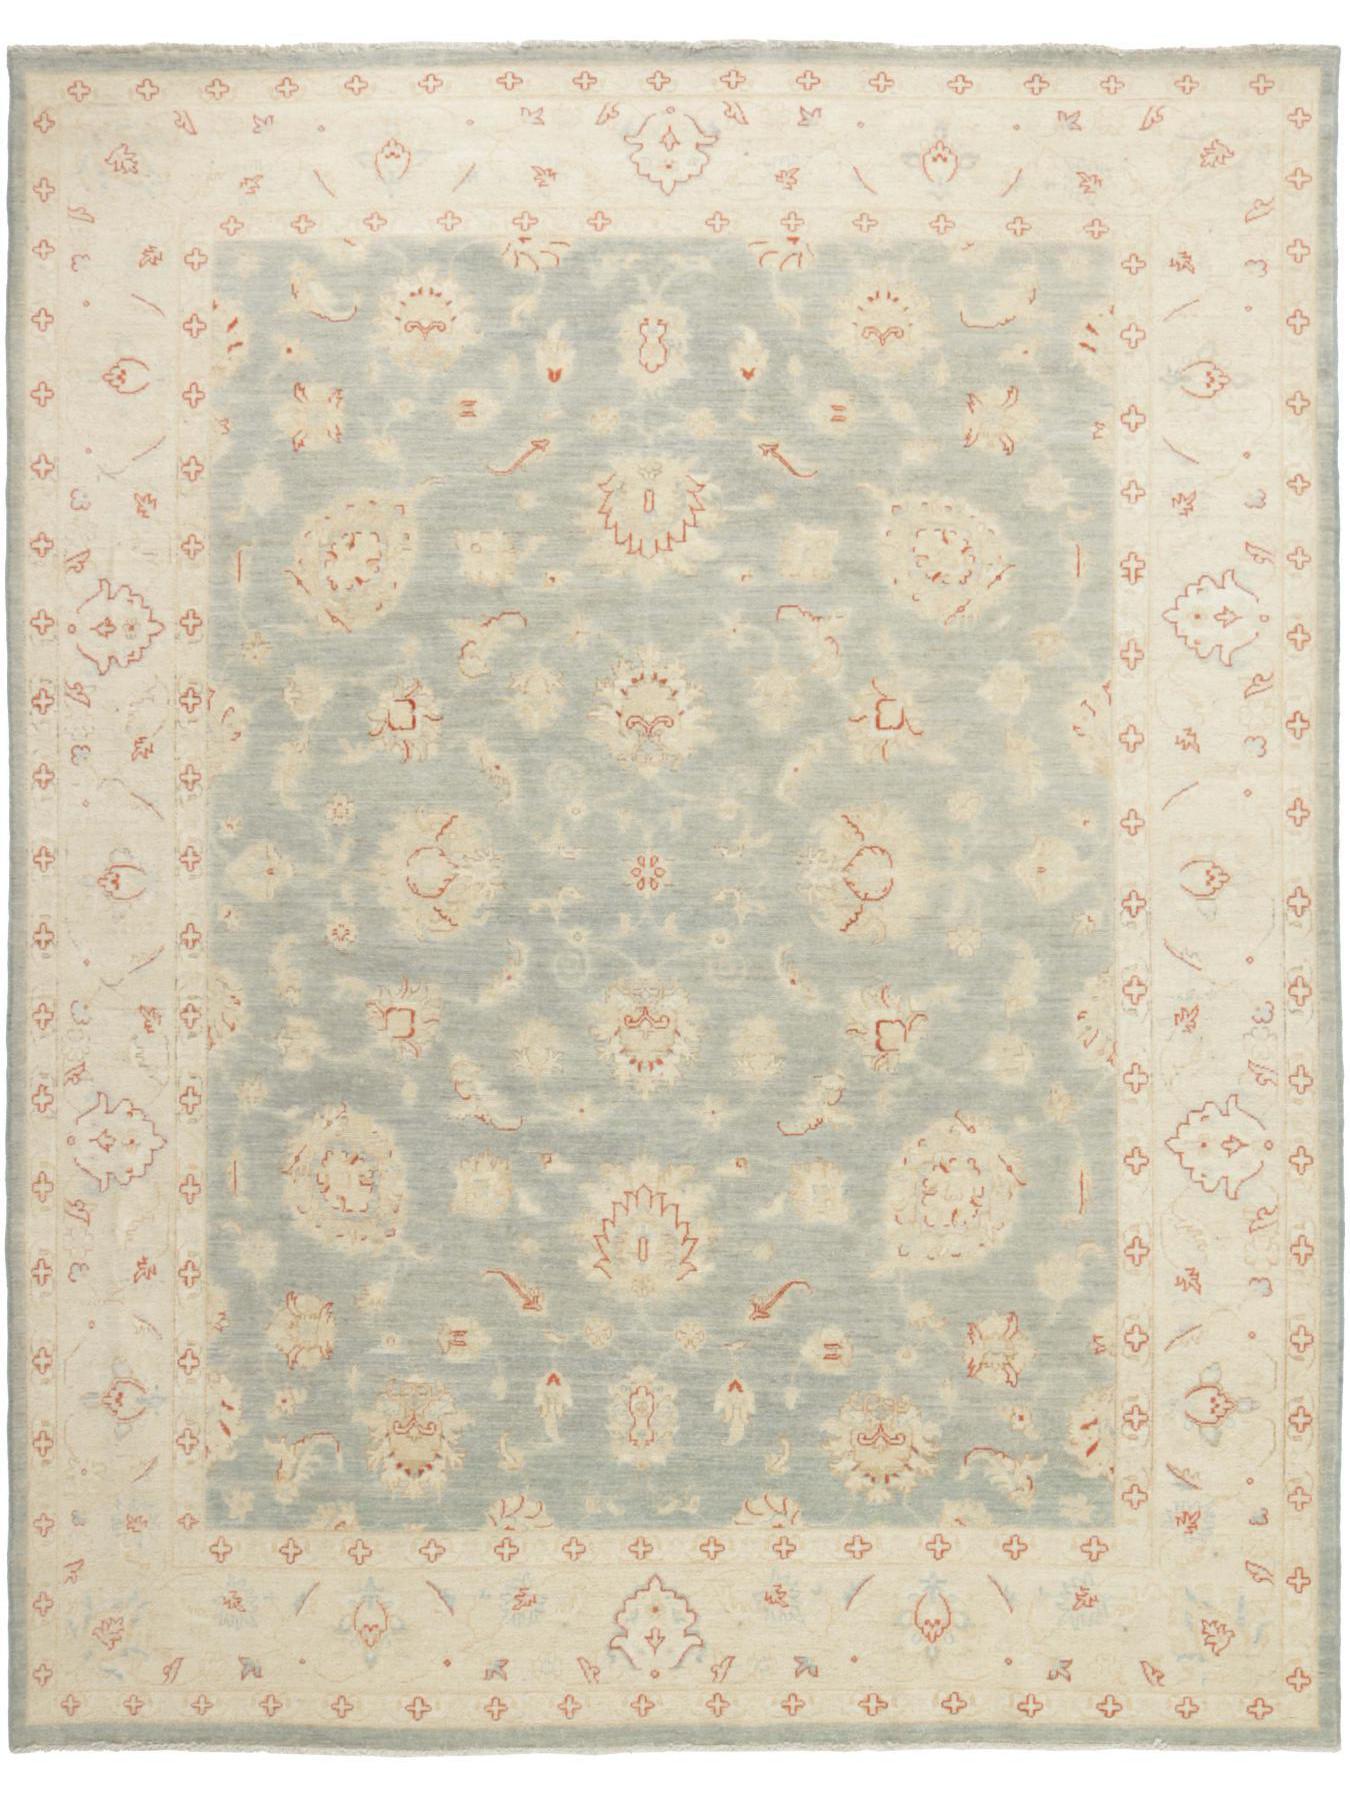 Ziegler carpets - Ghaznavi neo-classic